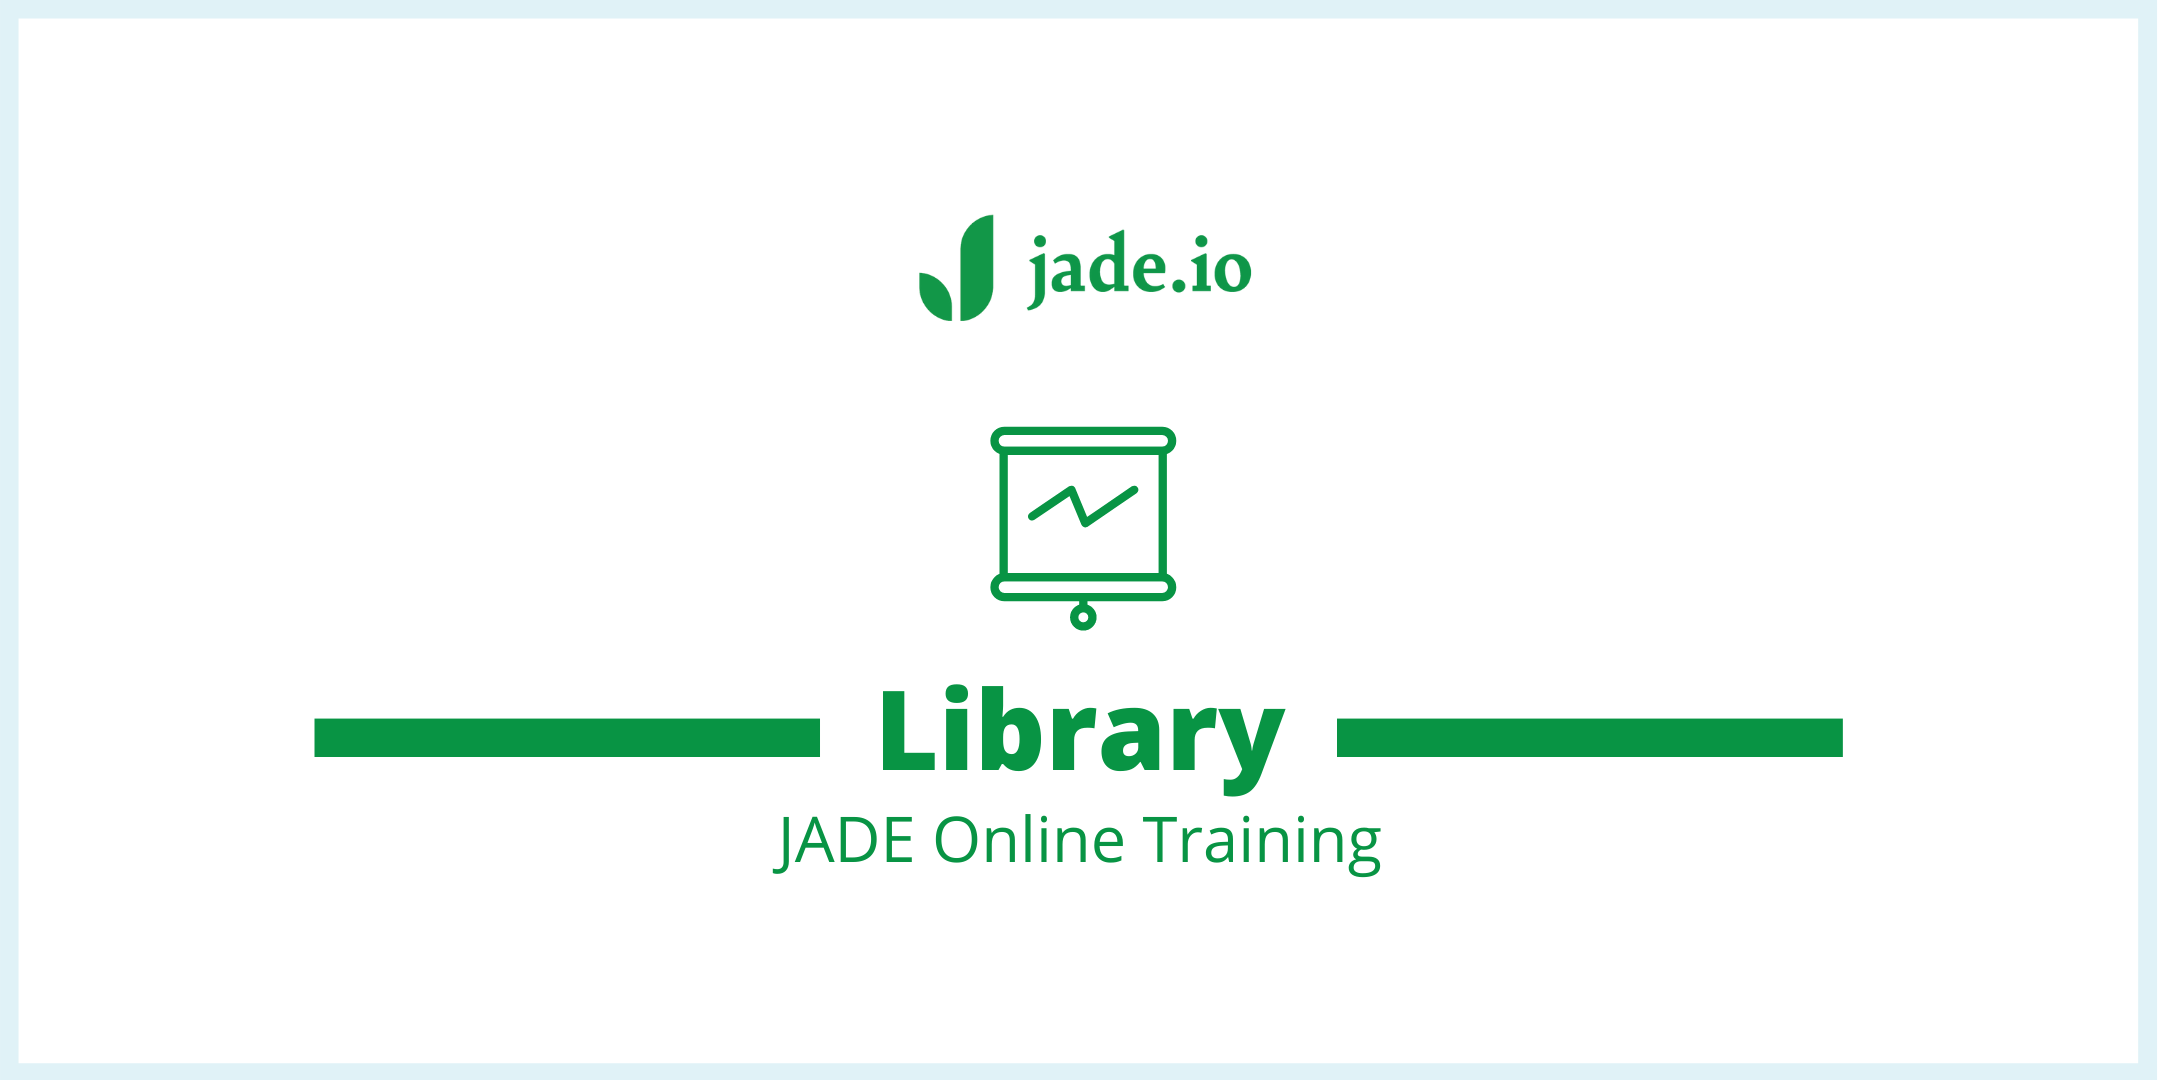 JADE training banner with jade.io logo and heading Library JADE Online Training